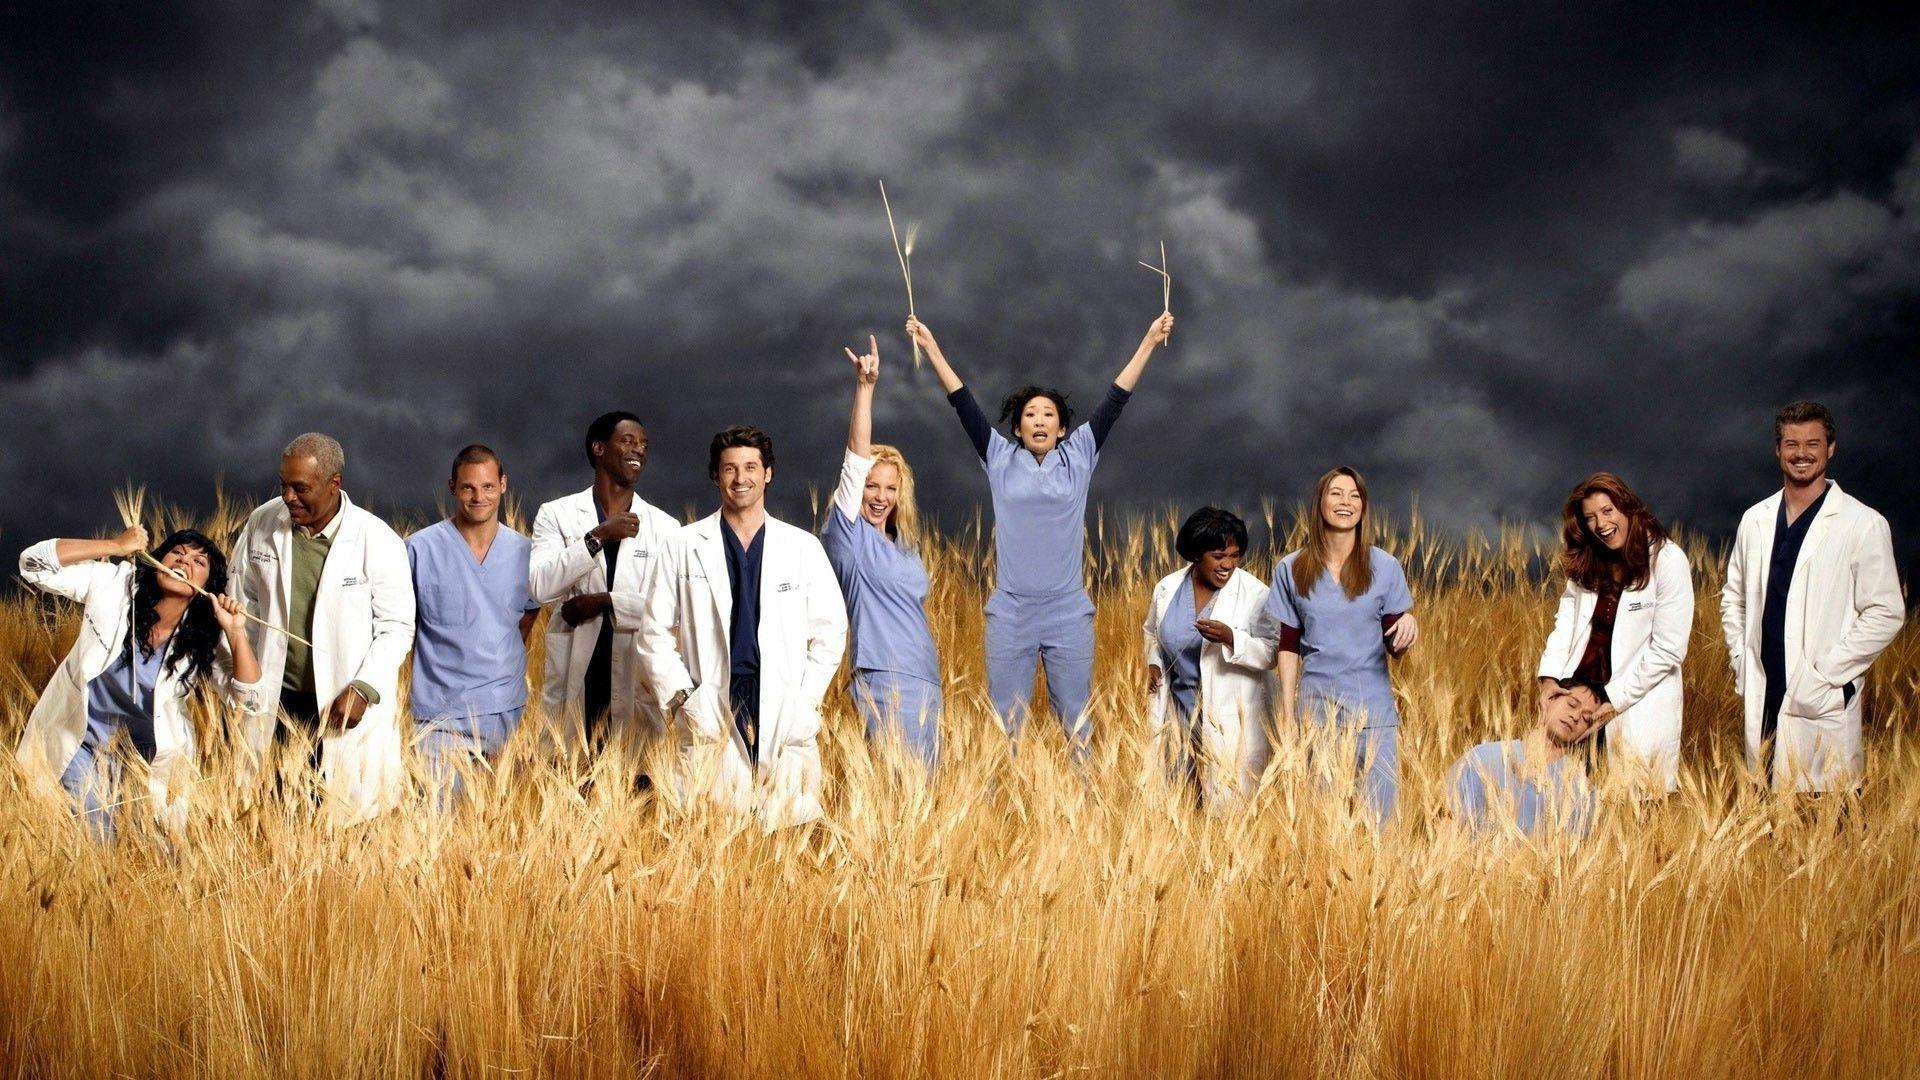 Greys Anatomy wallpaper